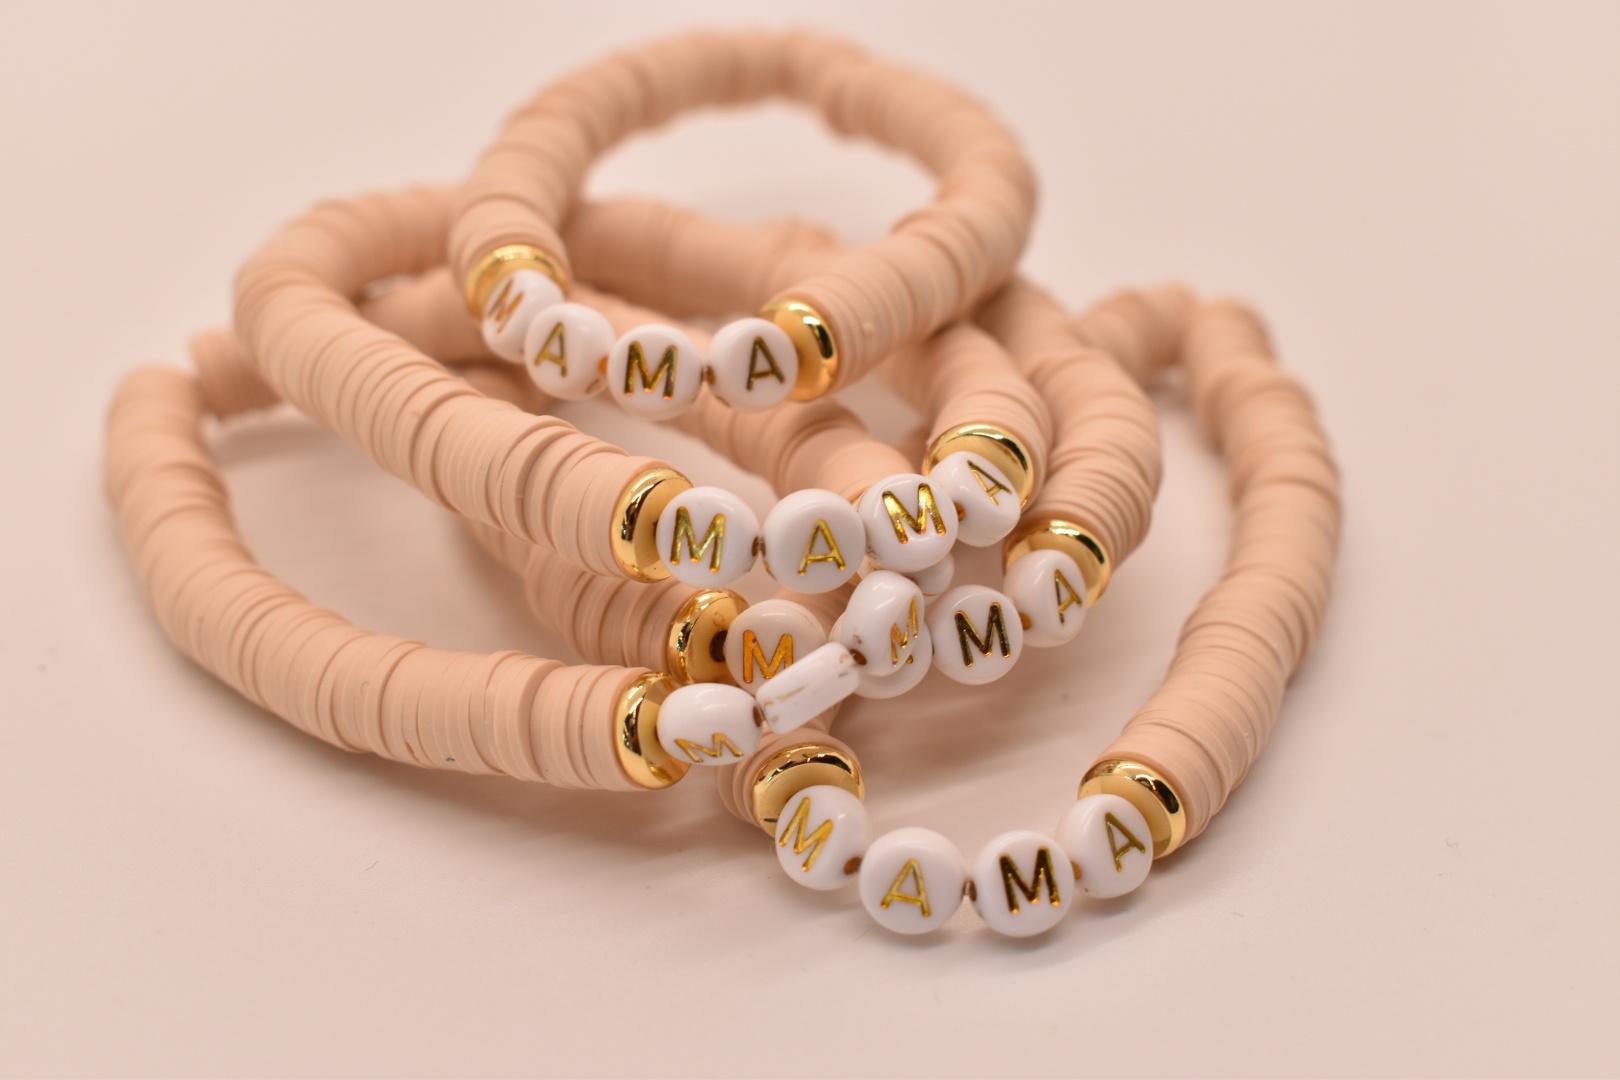 Mod Miss Jewelry - MM MM JEBR - Mama Color Pop Bracelet, Tan, Medium